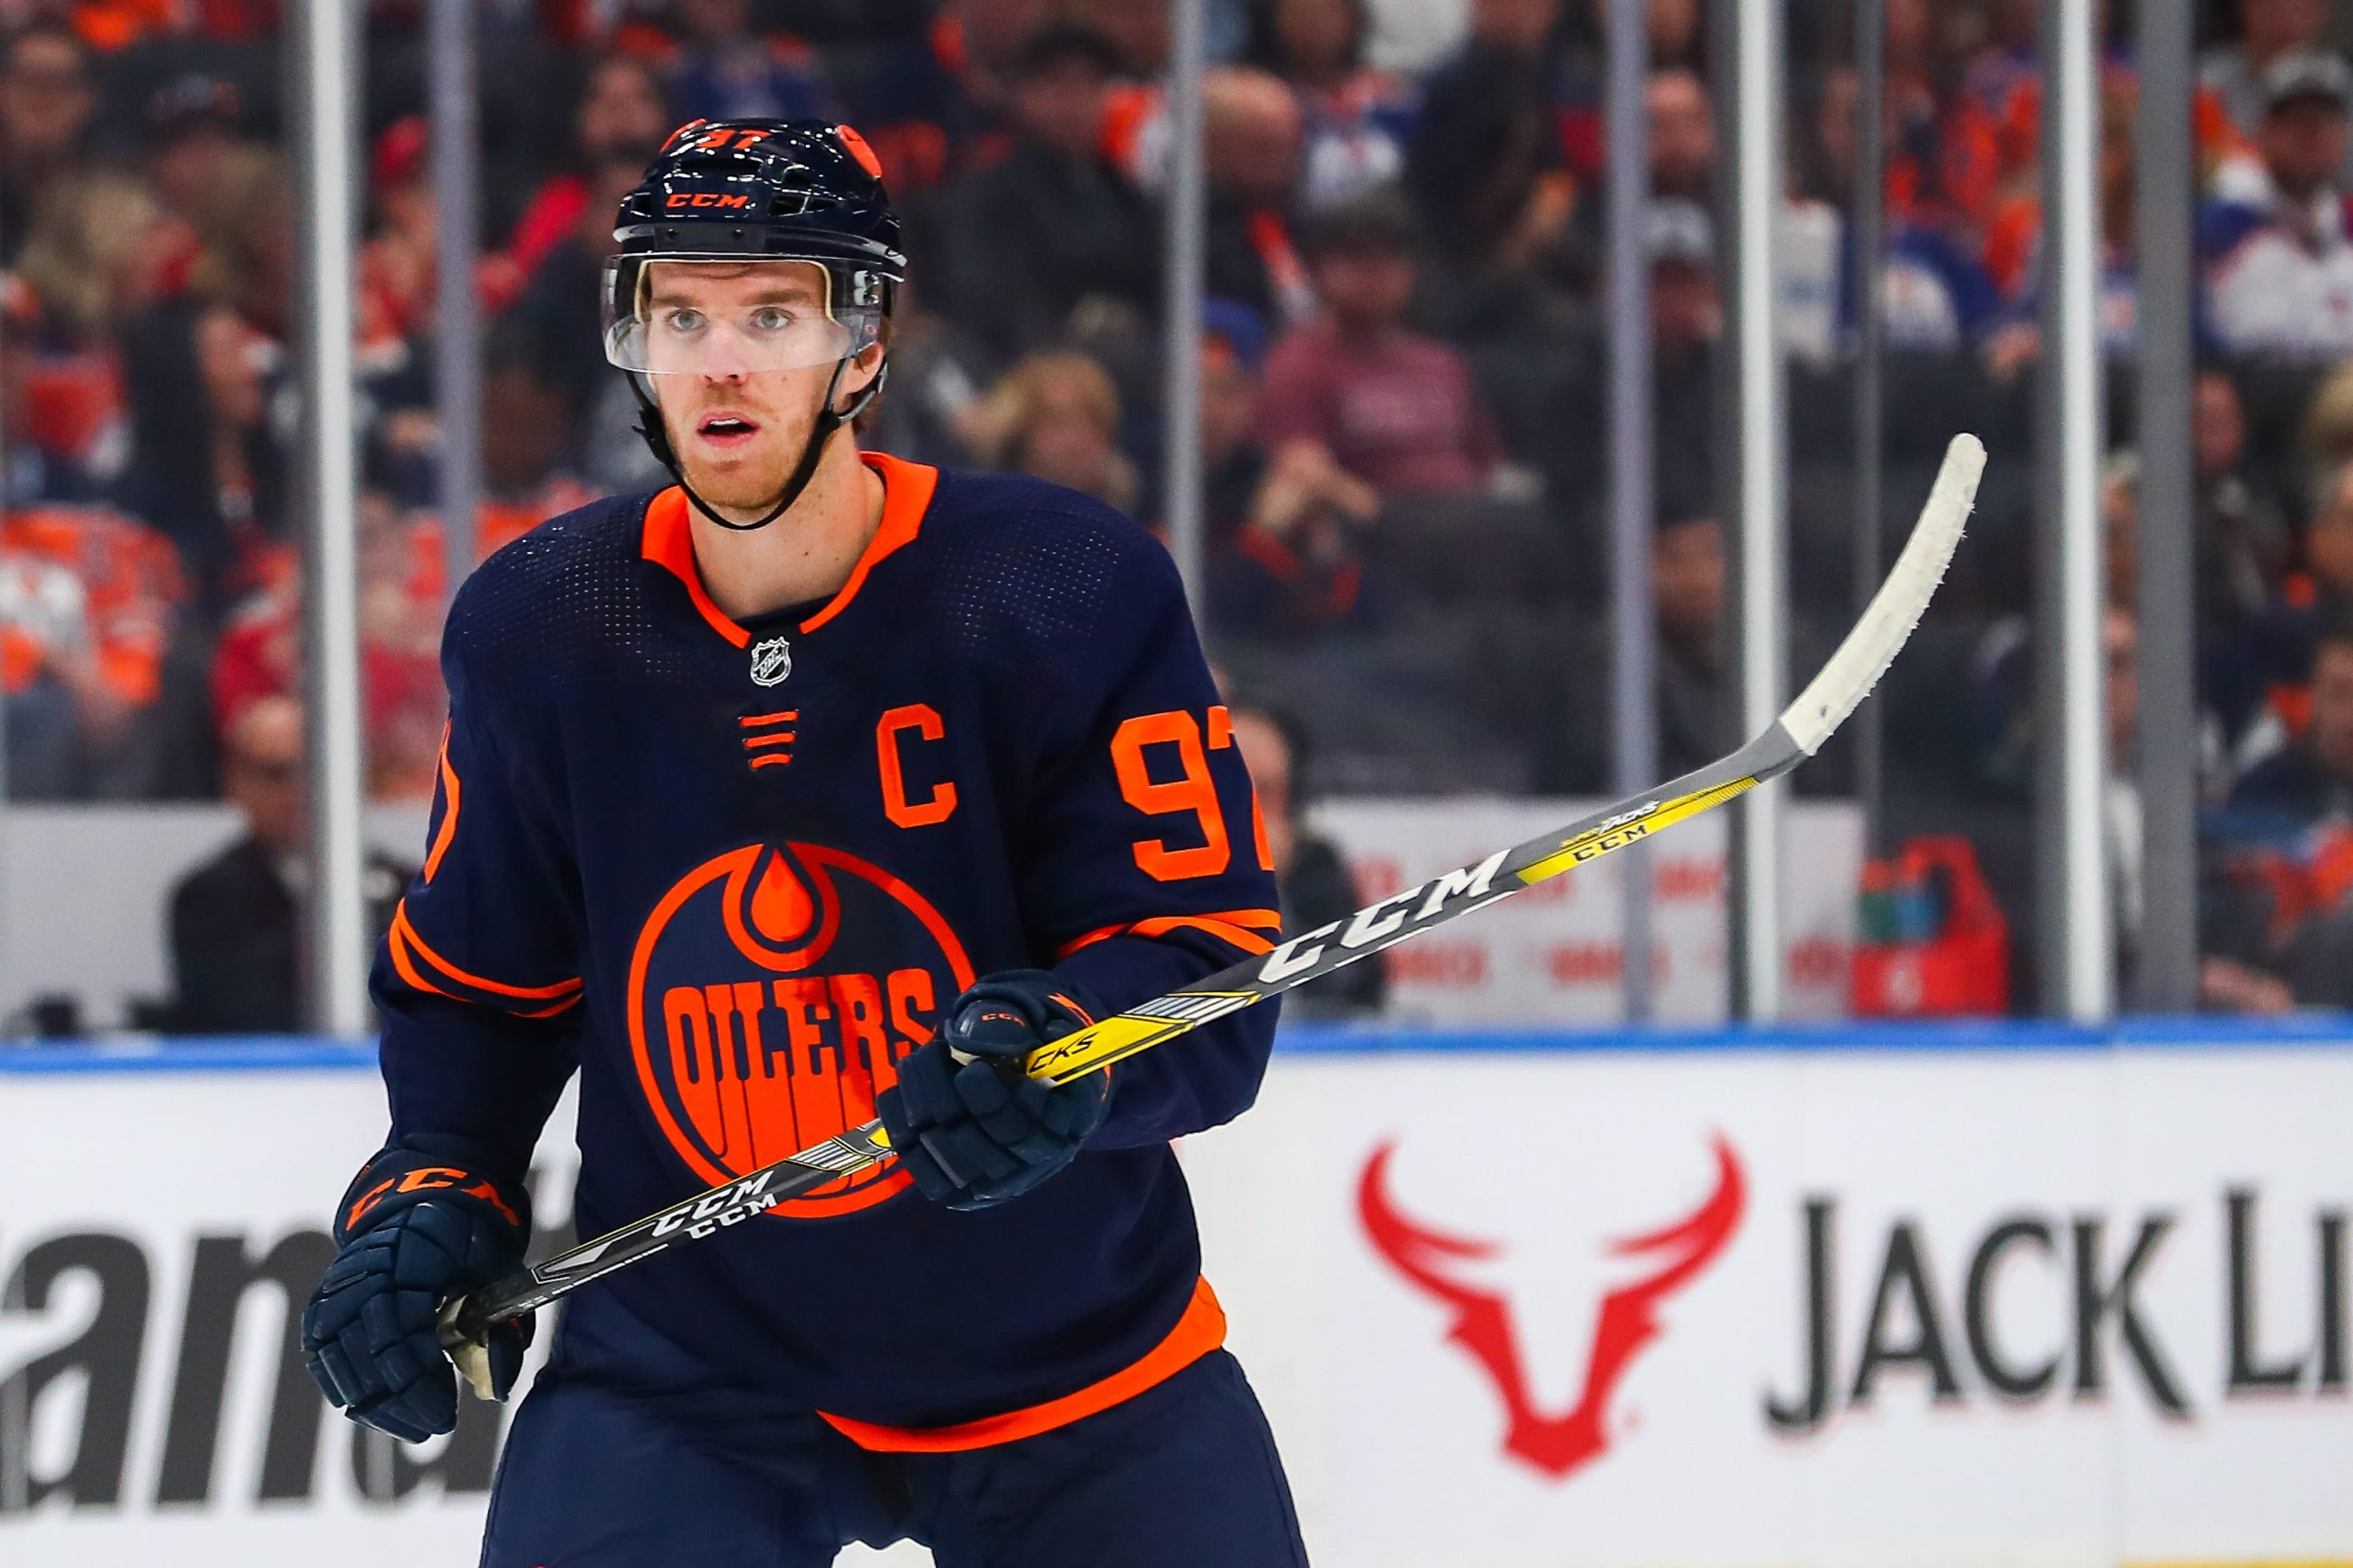 Ranking the NHL's alternate jerseys for the 2019-20 season